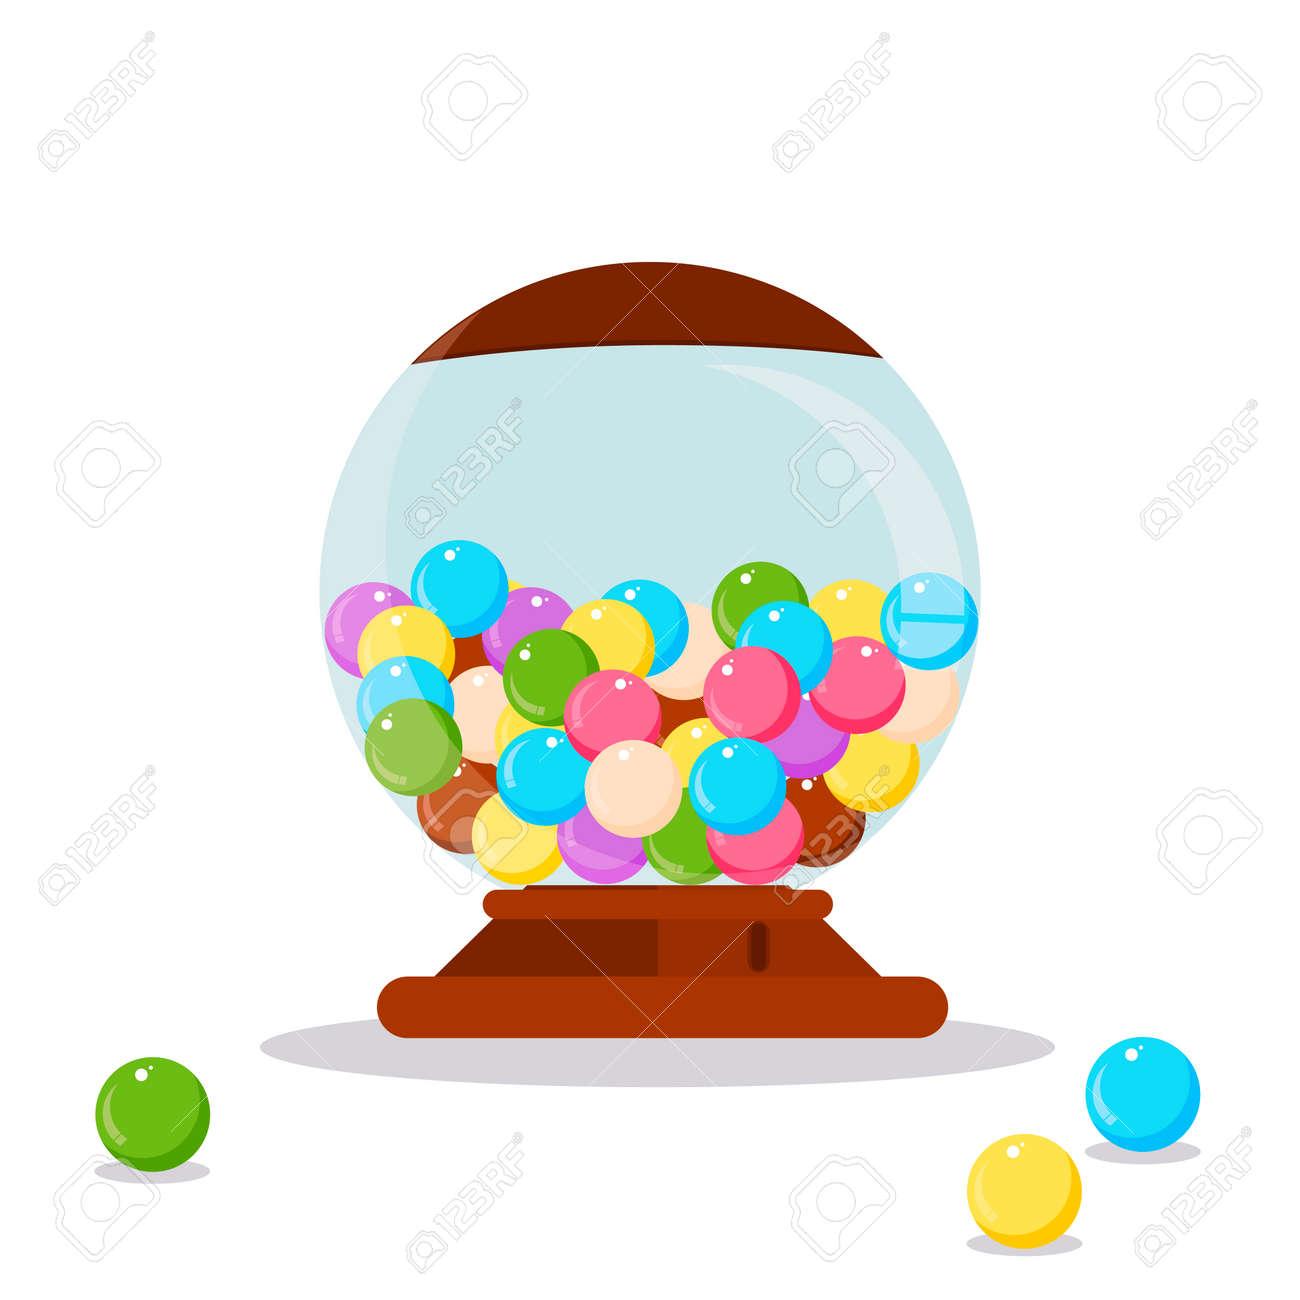 hight resolution of vector gumball machine illustration gumball bubblegum machine dispenser vector illustration funny gumball